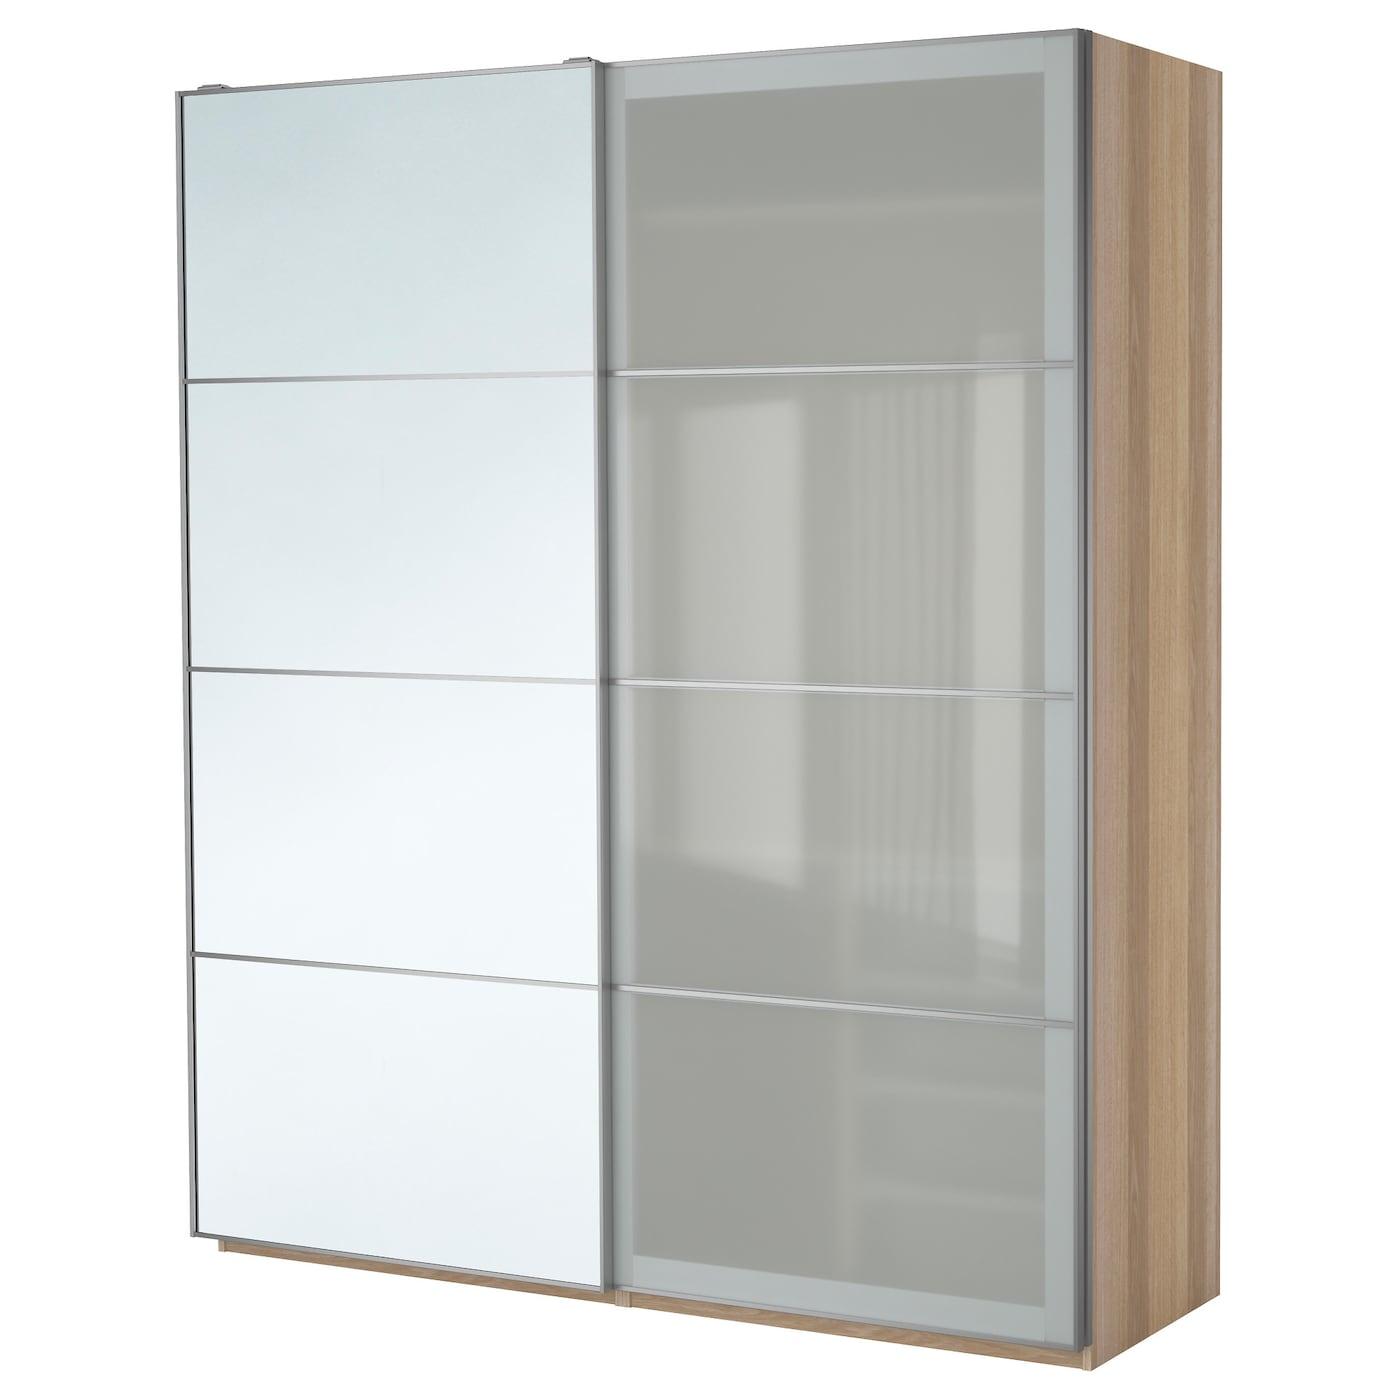 pax wardrobe white stained oak effect auli sekken 200 x 66. Black Bedroom Furniture Sets. Home Design Ideas